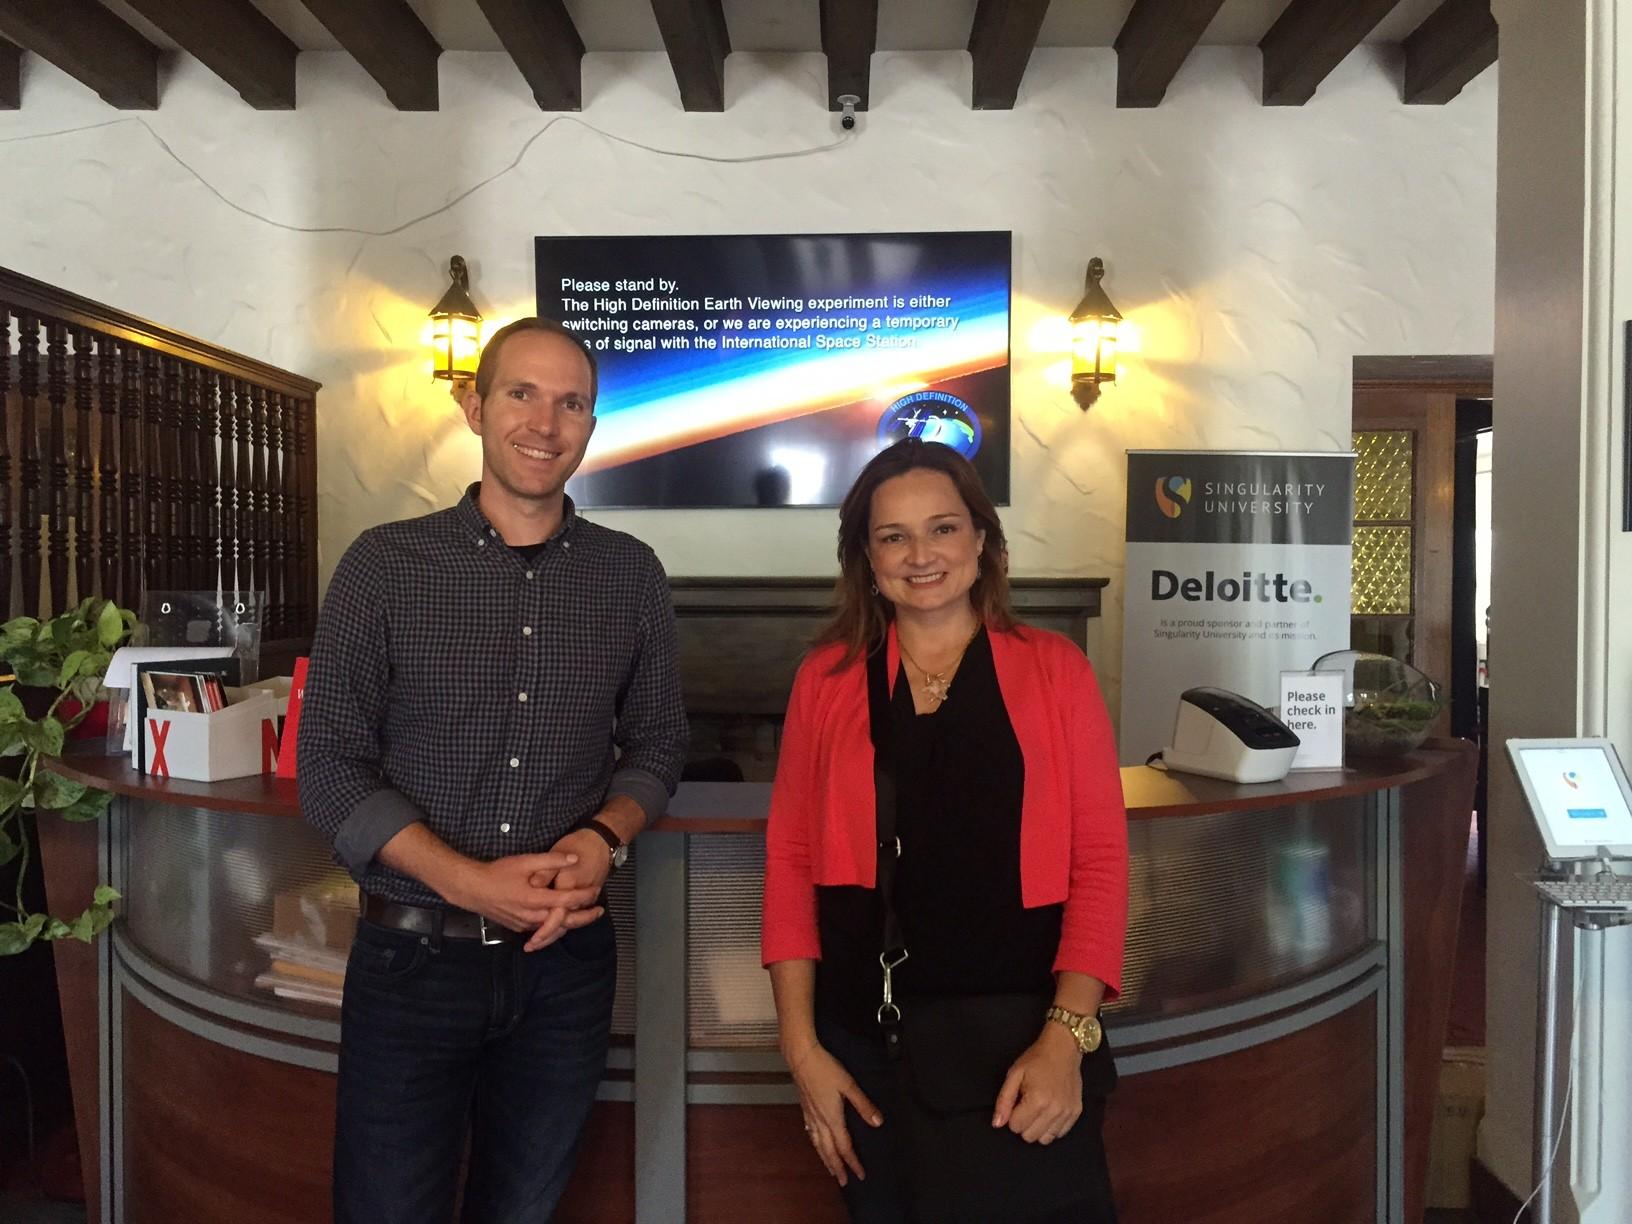 Kip Stringfellow e Fernanda Thees, ainda no campus antigo da SU na Califórnia (Foto: Fernanda Thees)